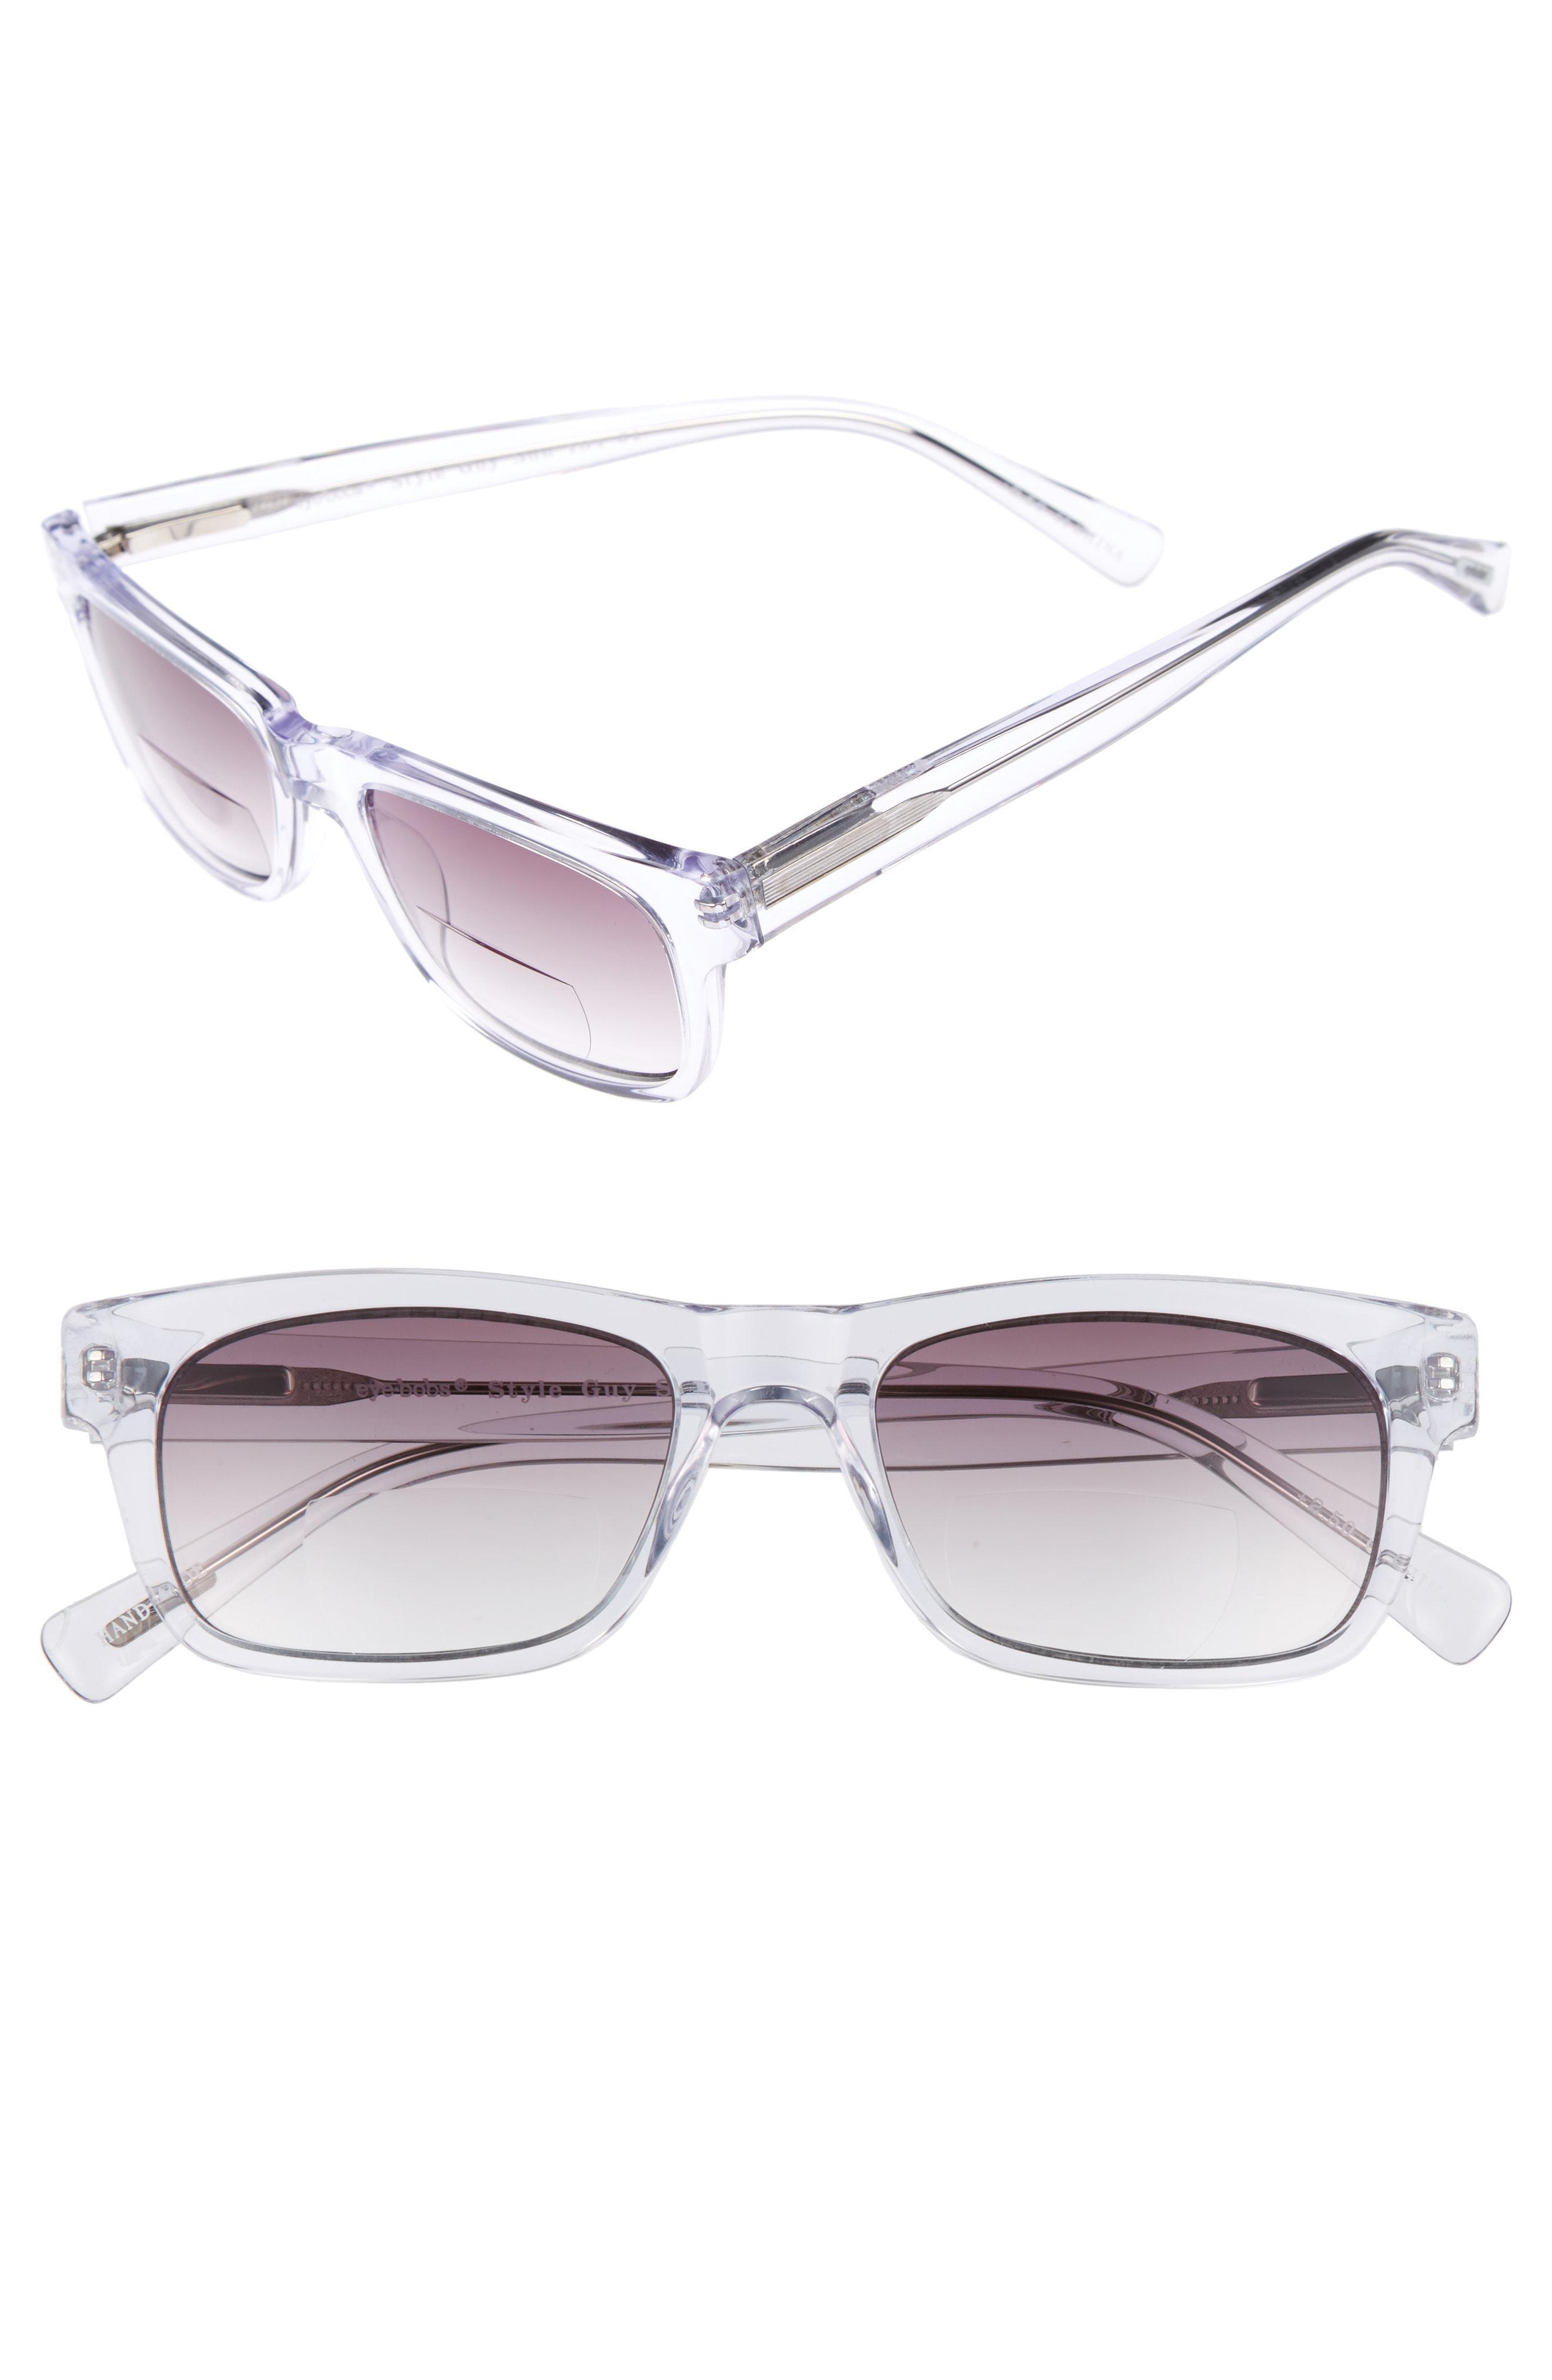 48e633e38c3 Lyst - Eyebobs Style Guy Sun Reader 52mm Reading Sunglasses - Clear ...